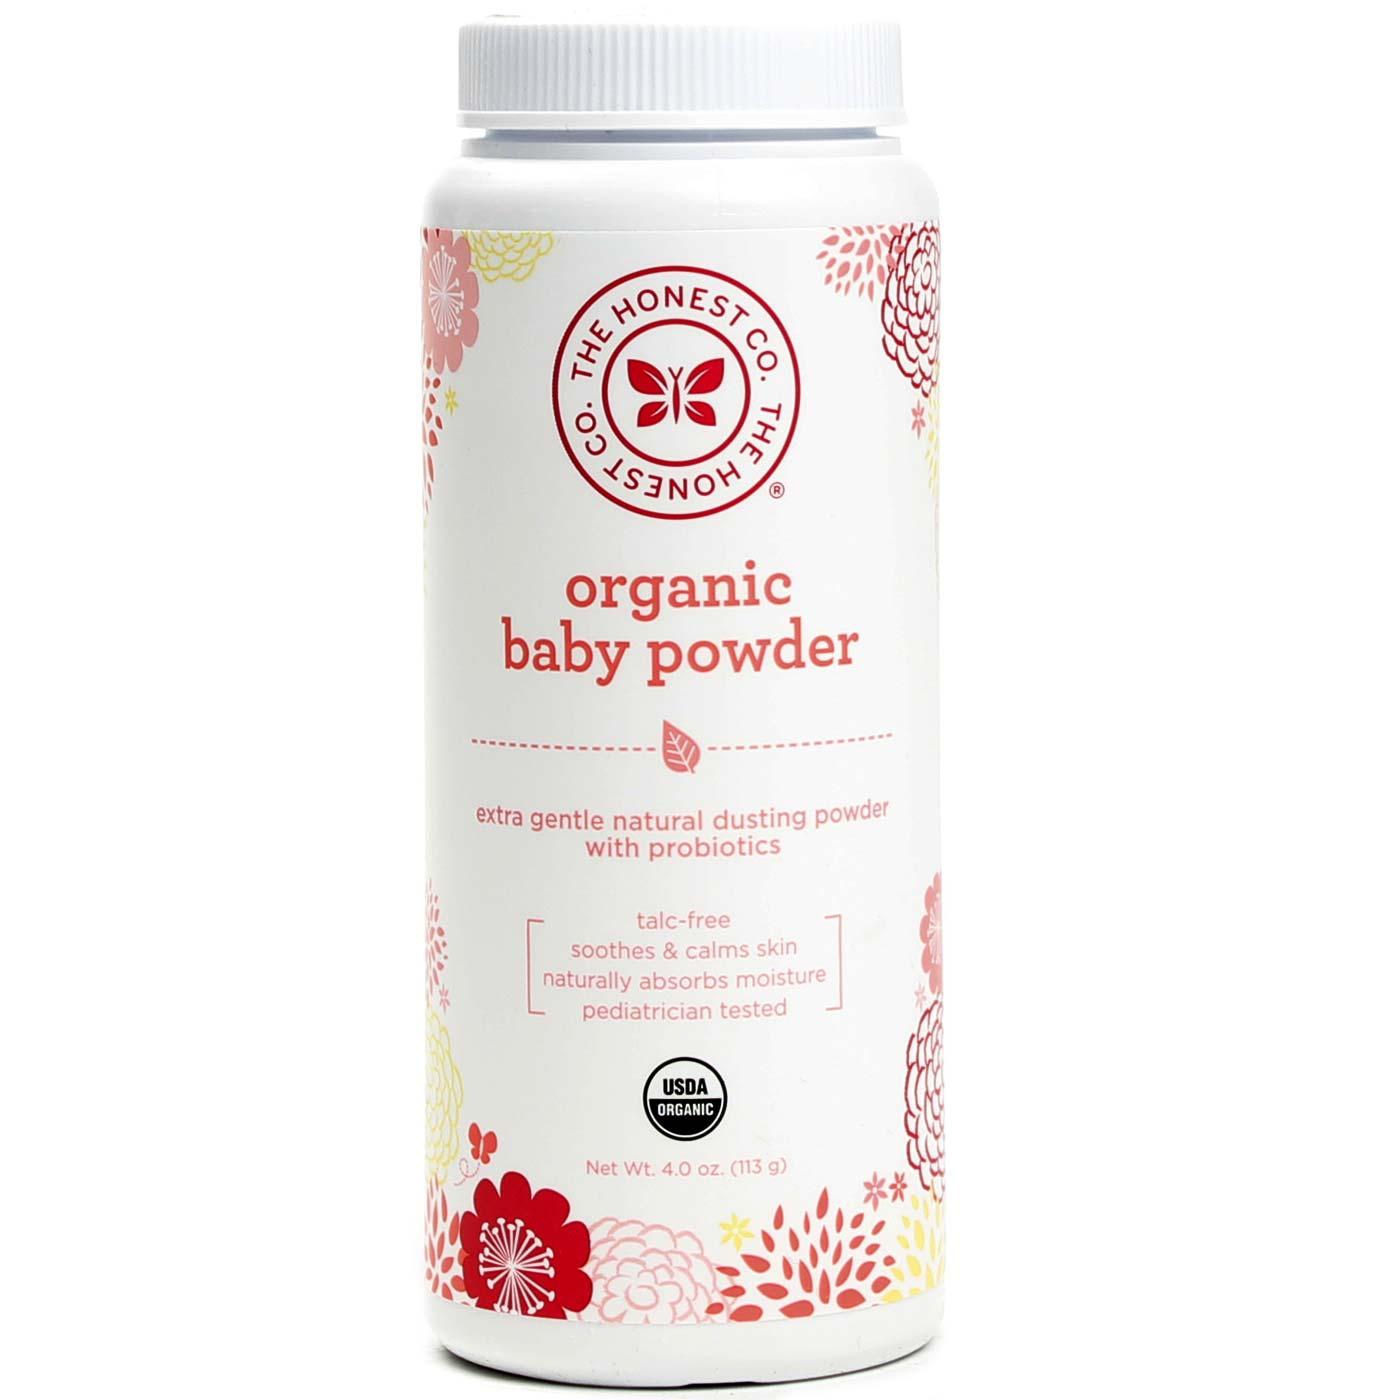 0a40209c4b8f7 The Honest Company Organic Baby Powder - 4 oz